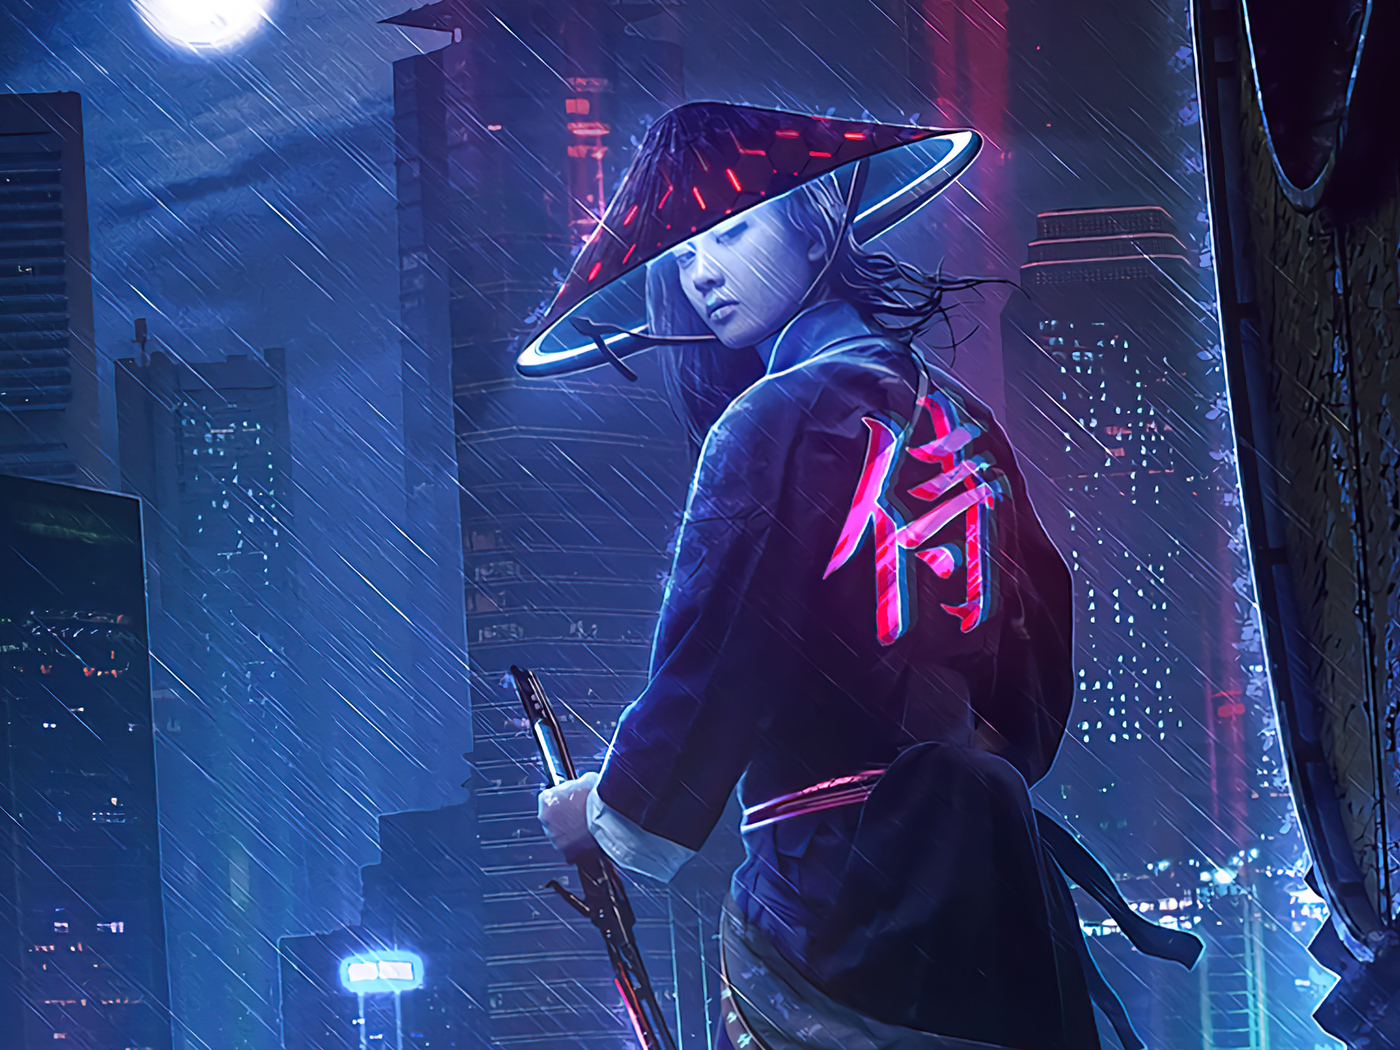 neon-samurai-girl-4k-5t.jpg